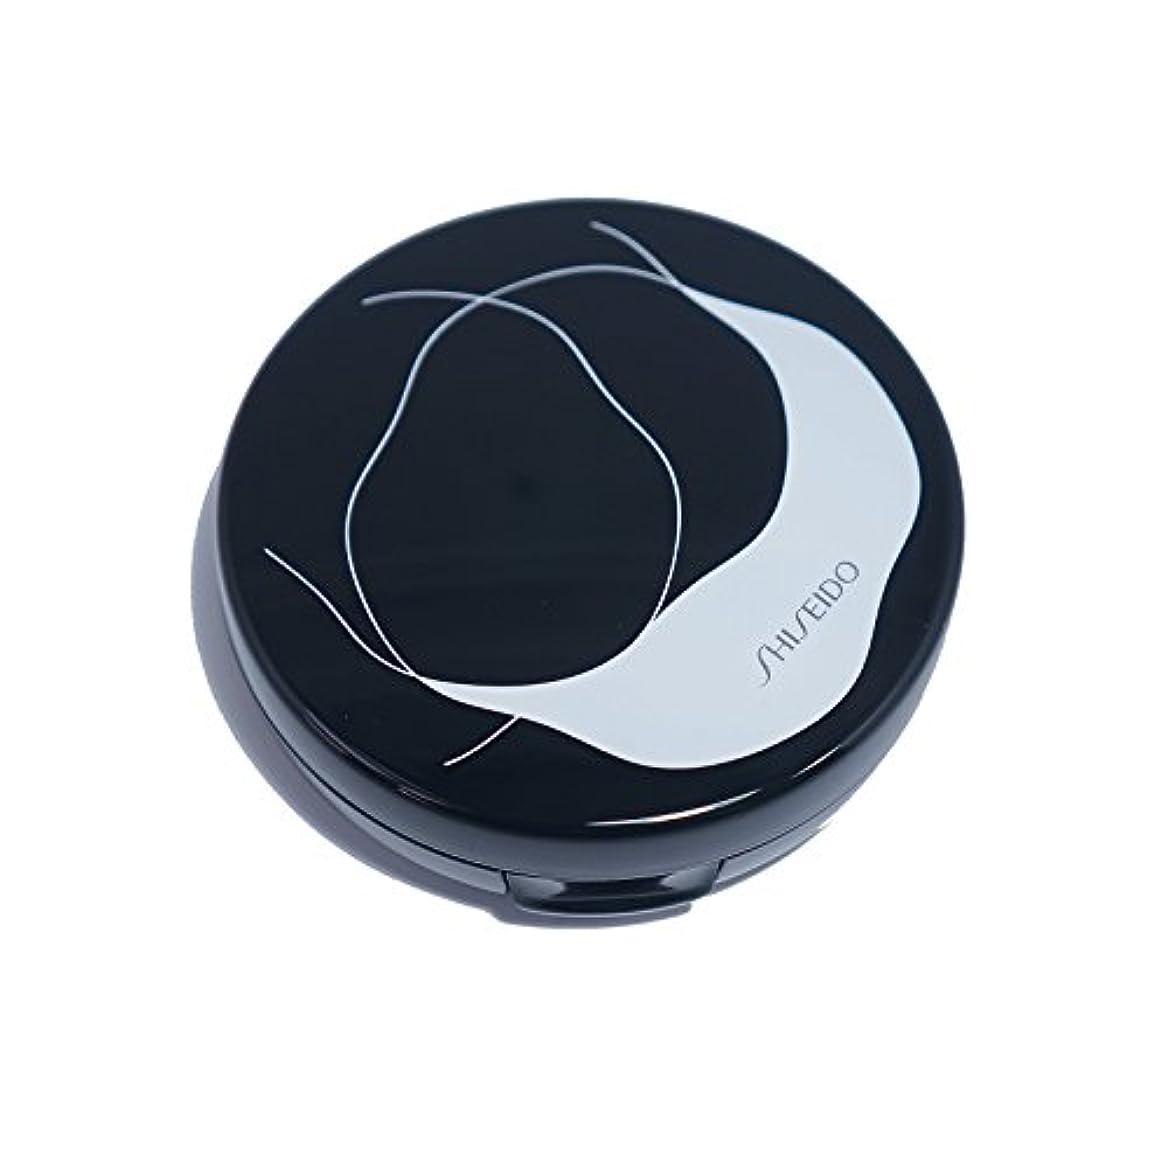 SHISEIDO 資生堂 シンクロスキン グロー クッションコンパクト オークル10 レフィル&ケースのセット 国内正規品